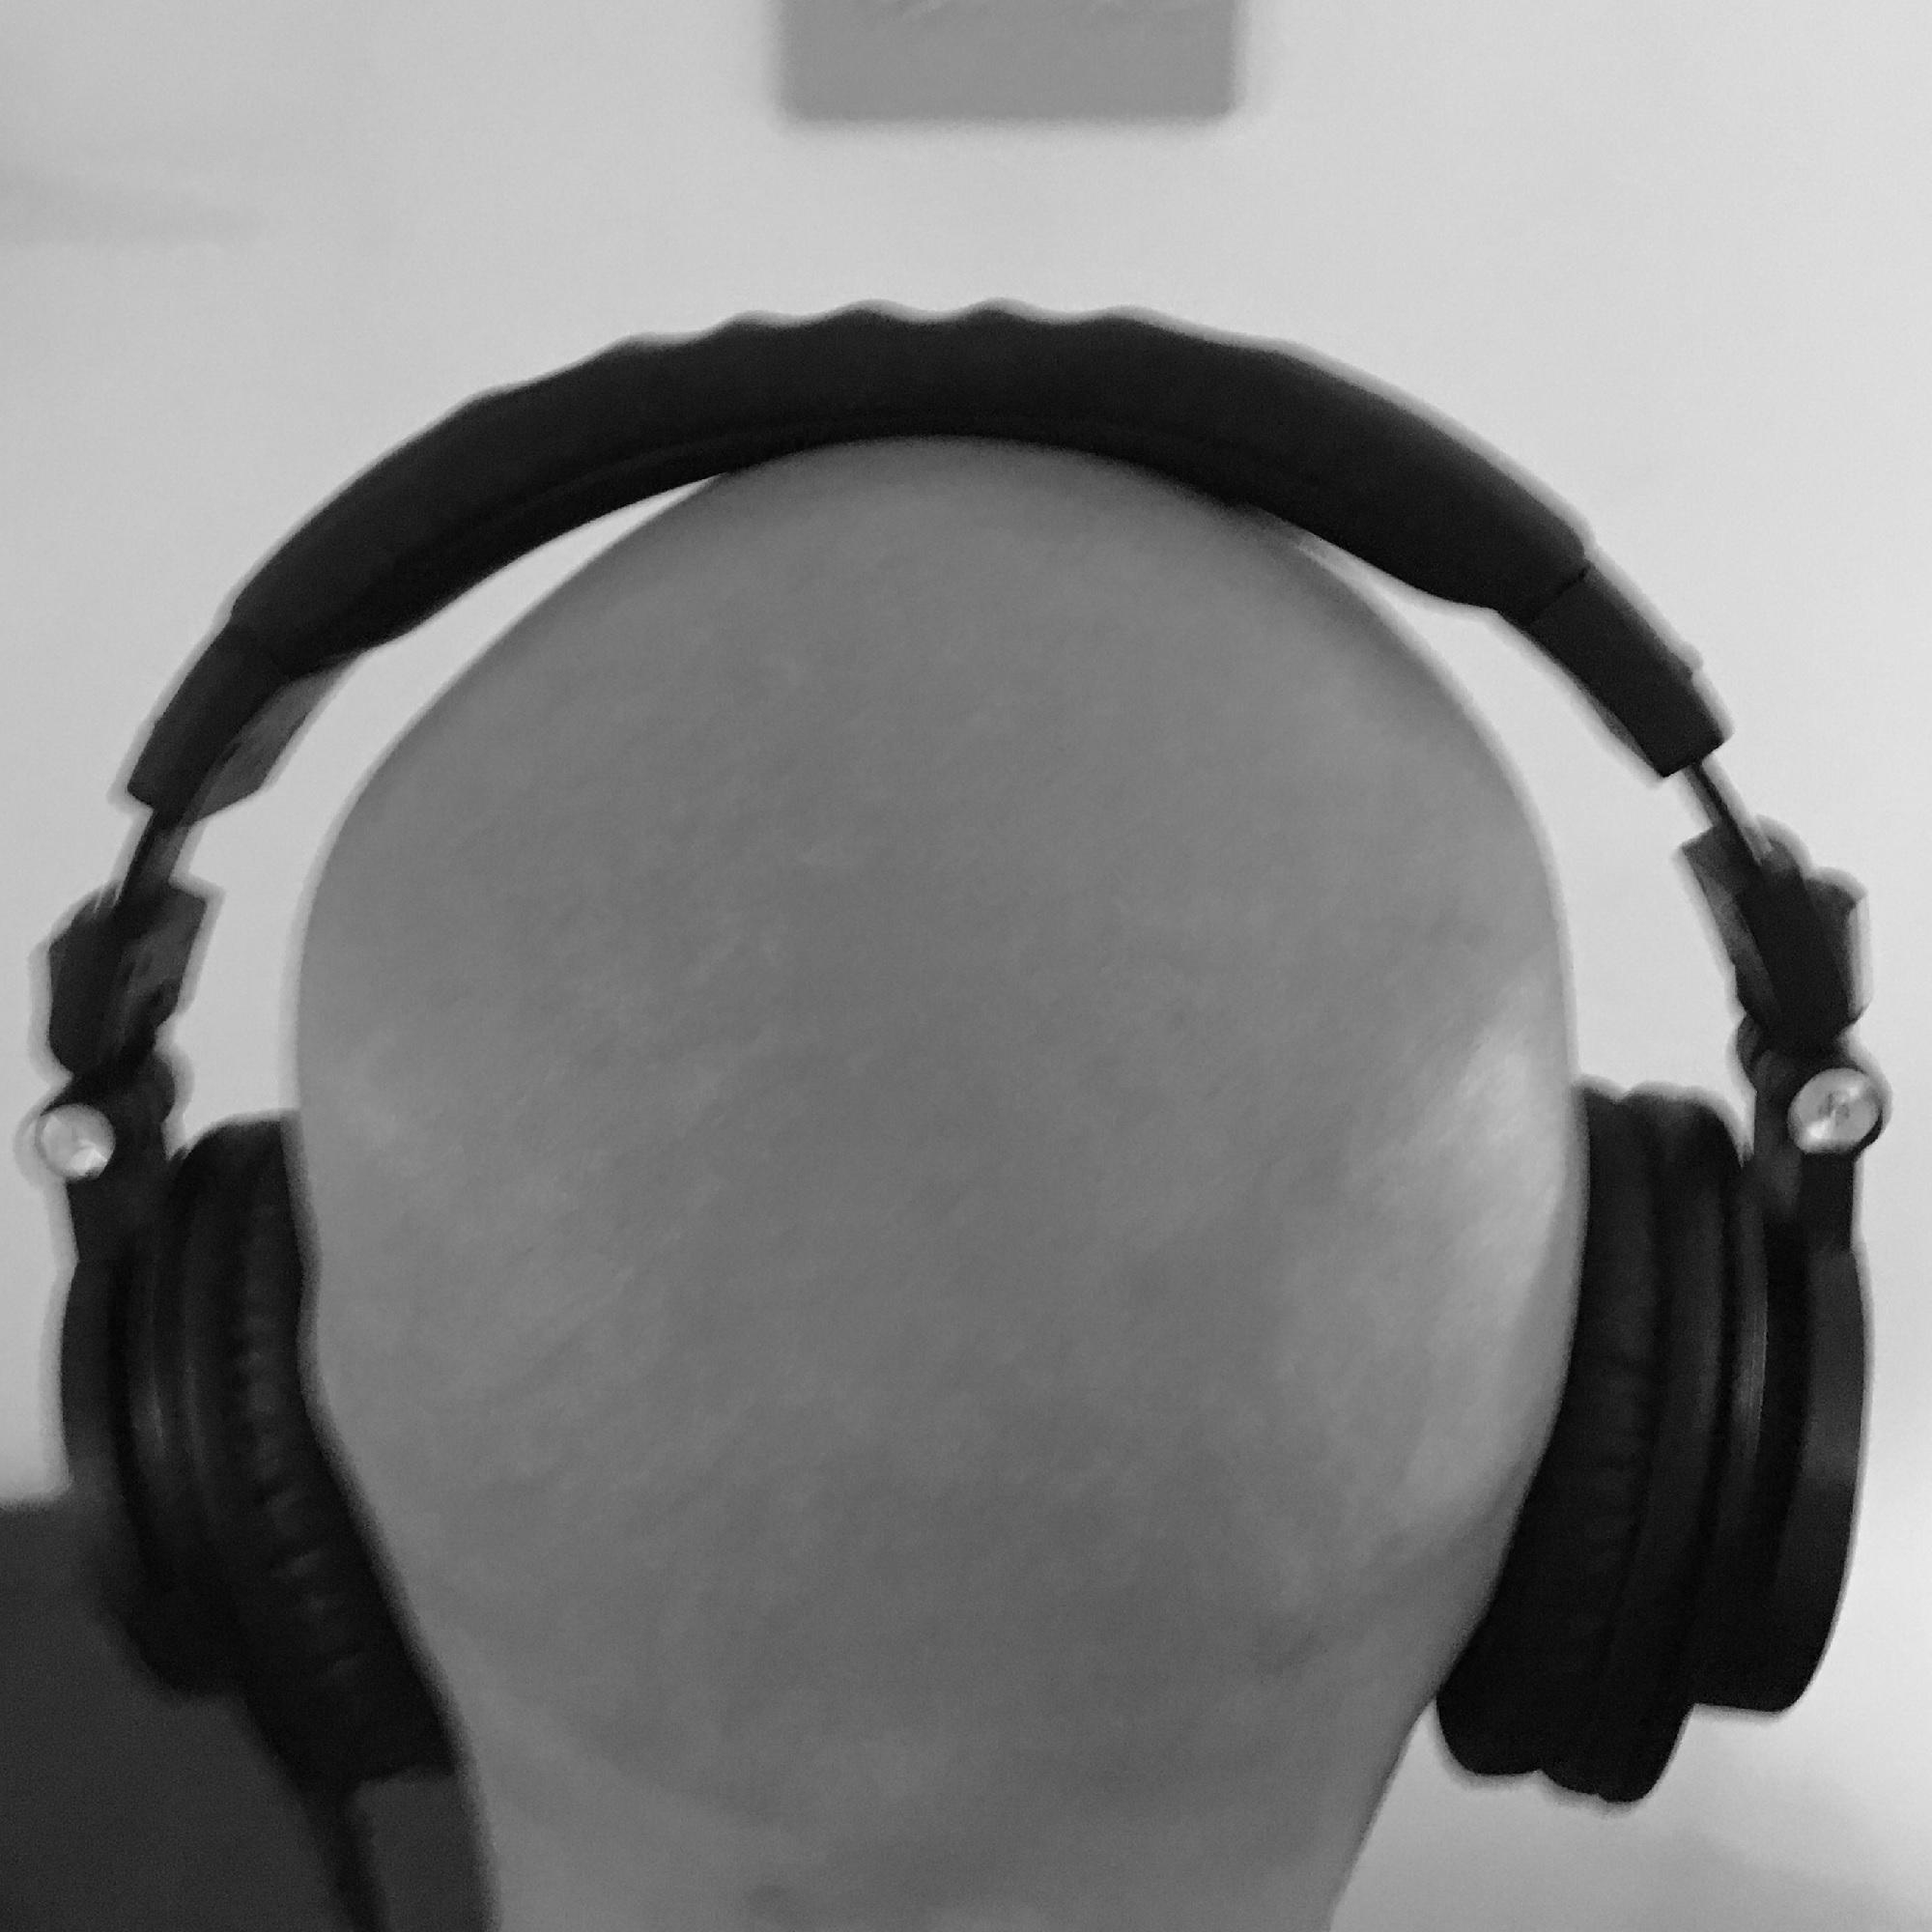 Bud Ears